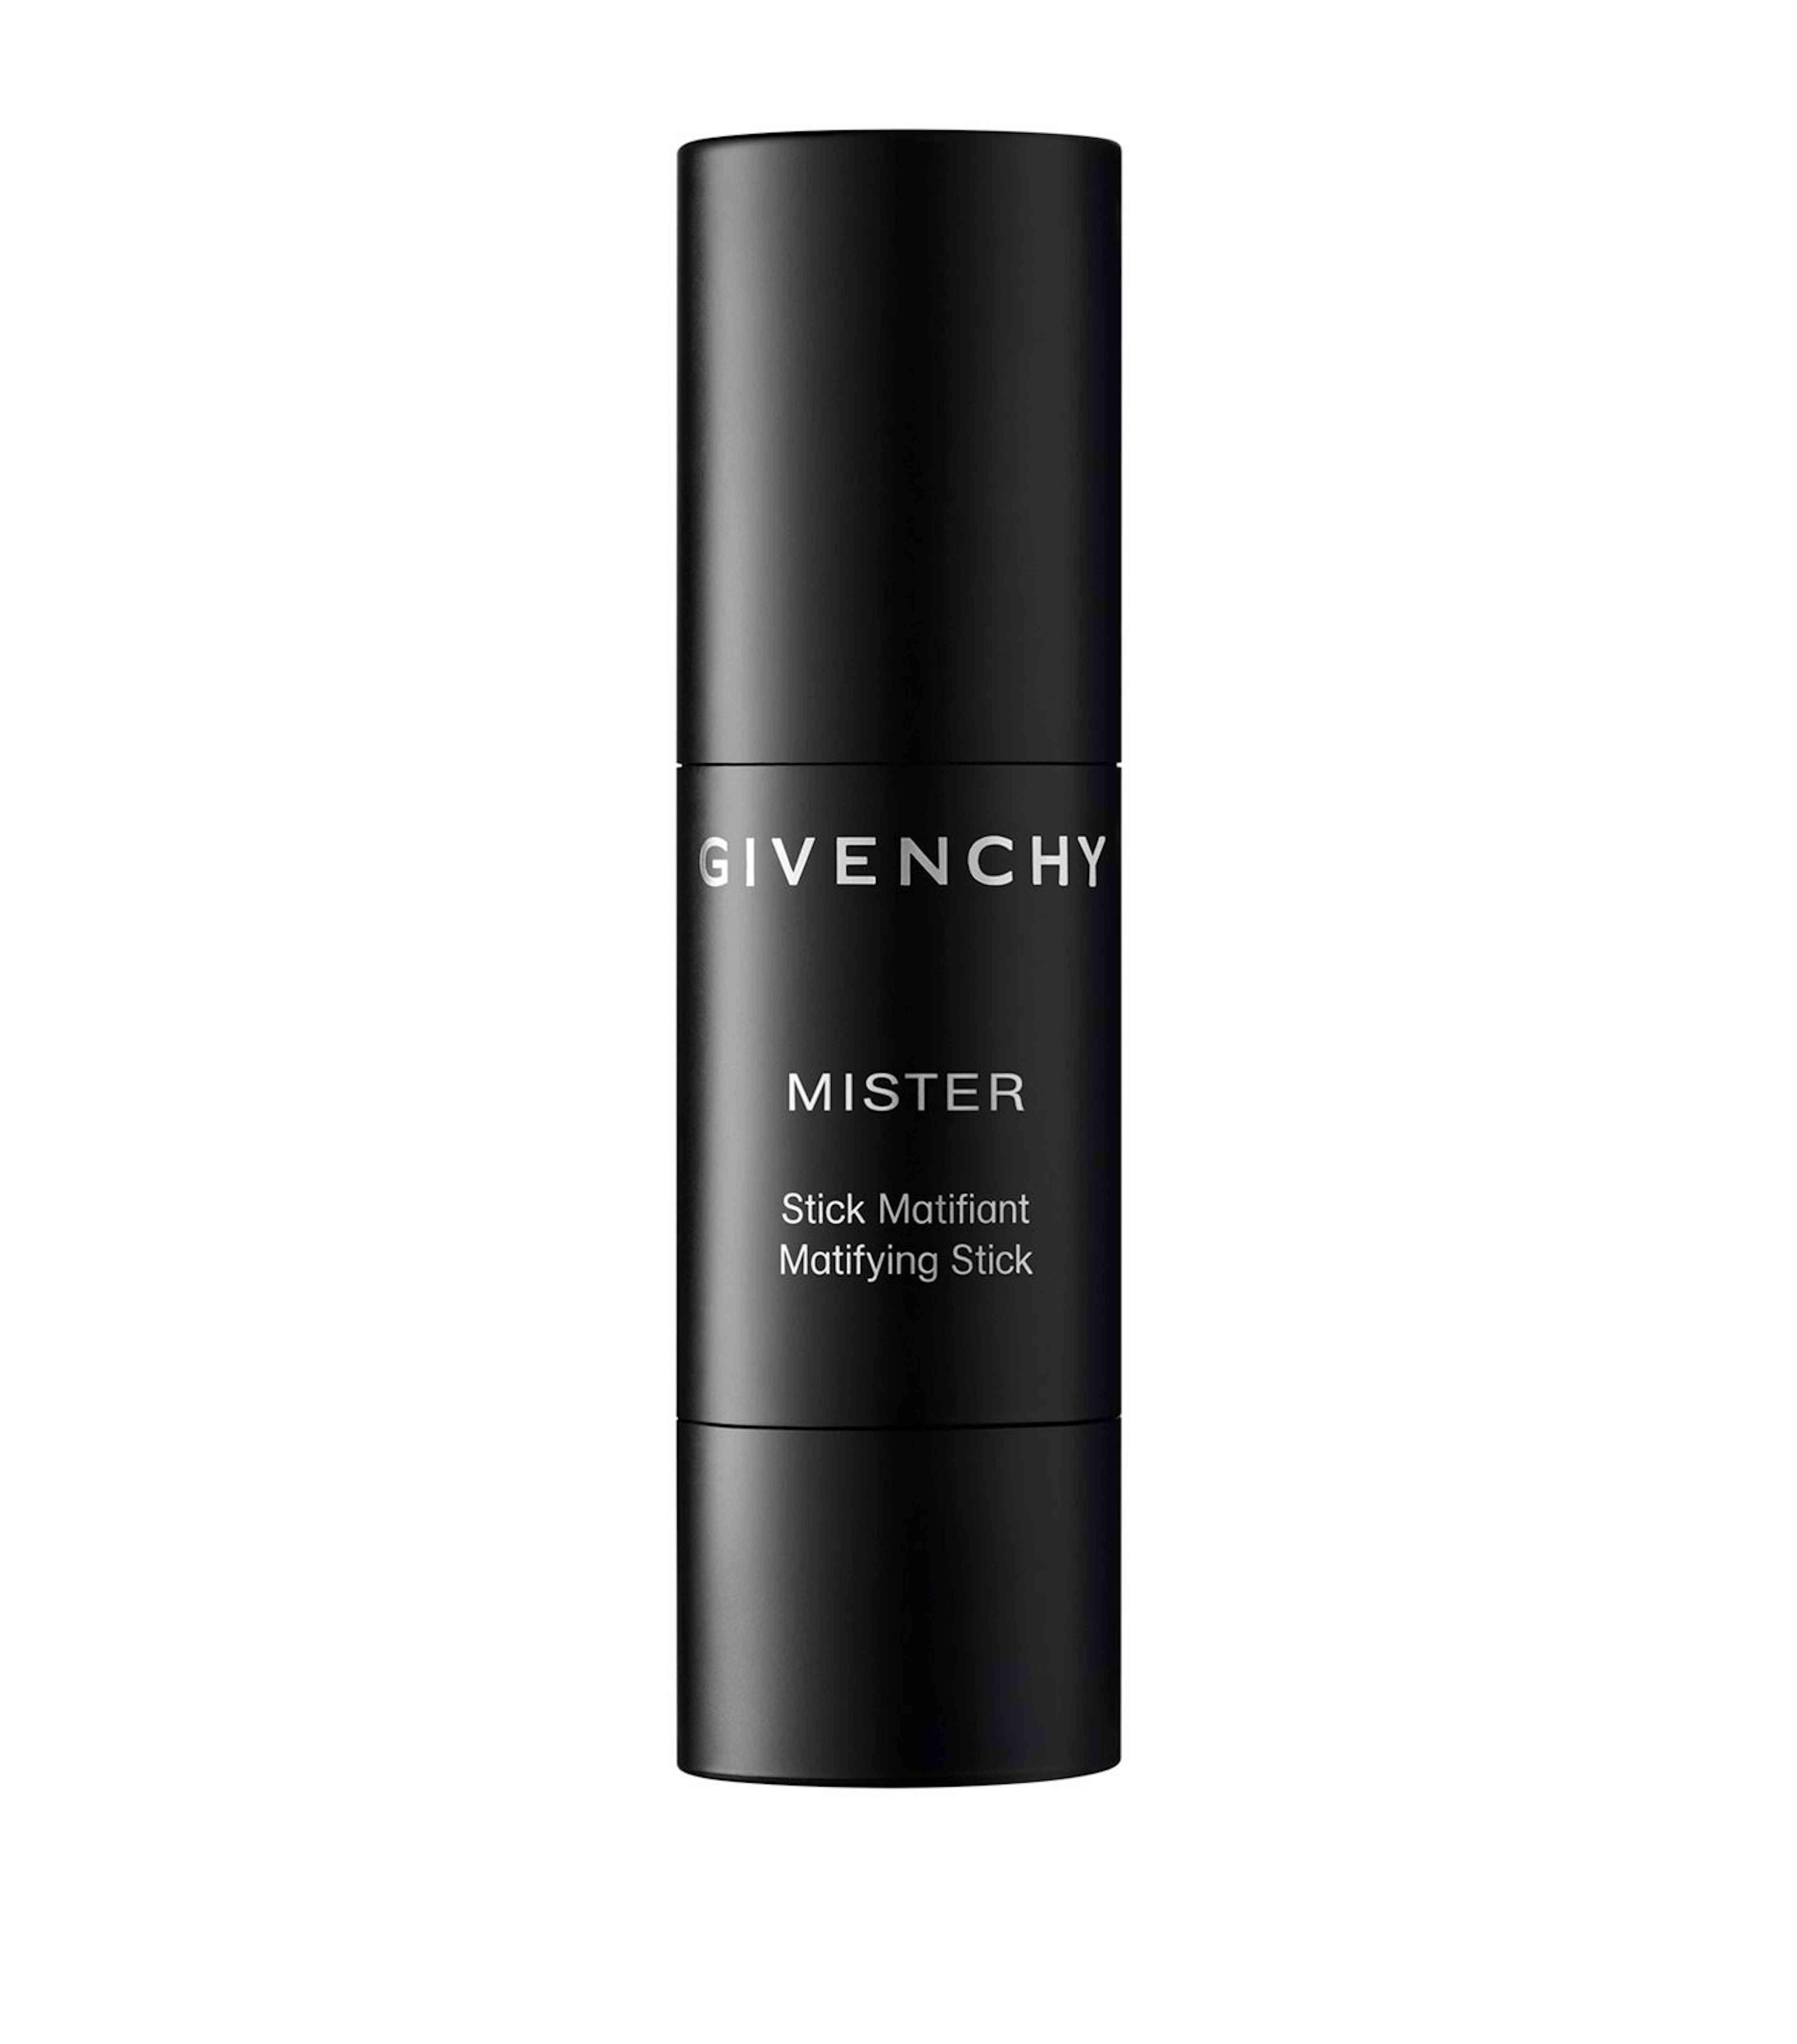 Givenchy Mister Mat Primer Stick